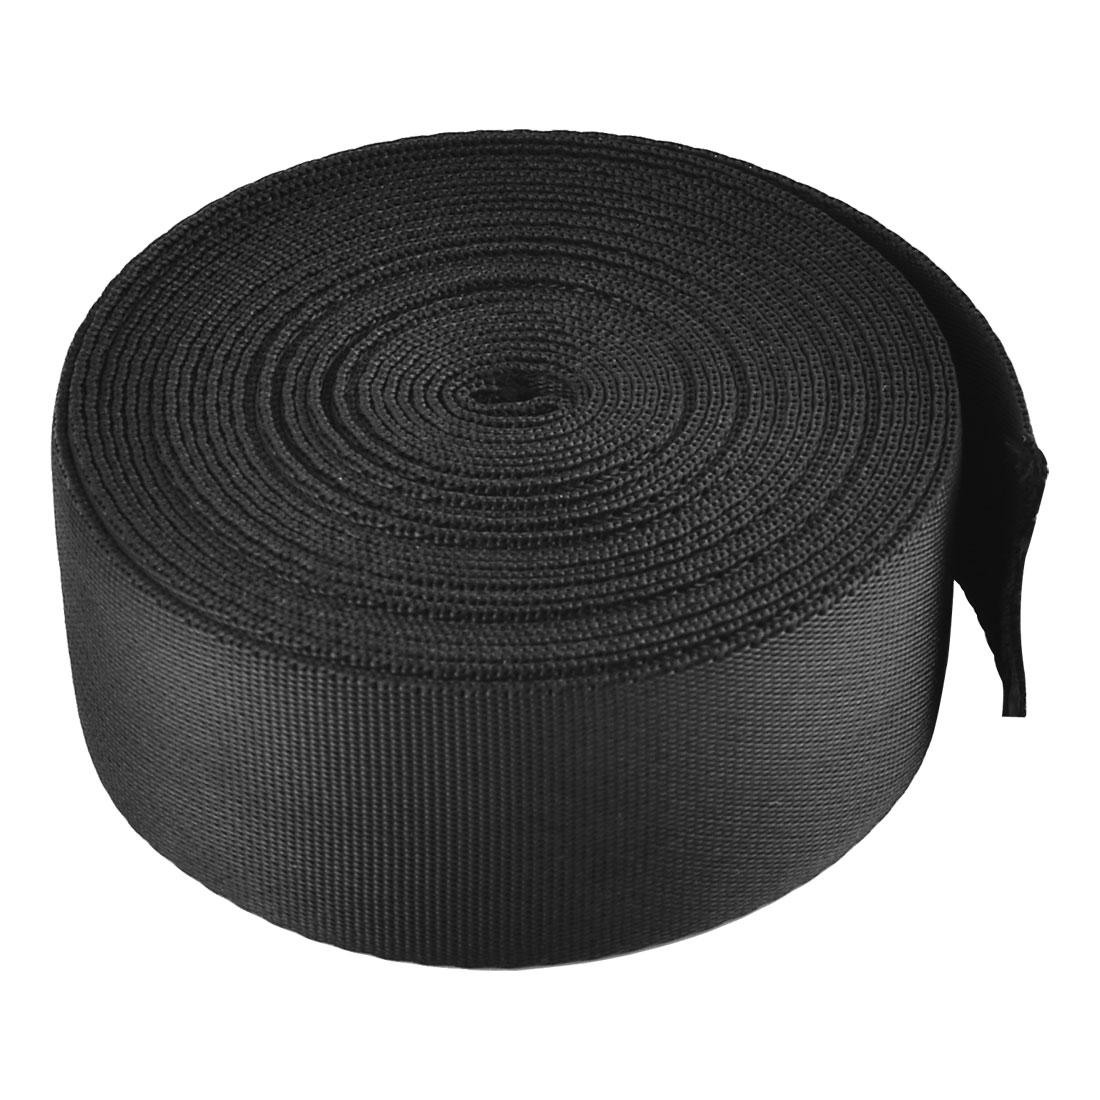 Household Nylon Suitcase Luggage Fastening Strap Belt Webbing Black 3.8 x 500cm